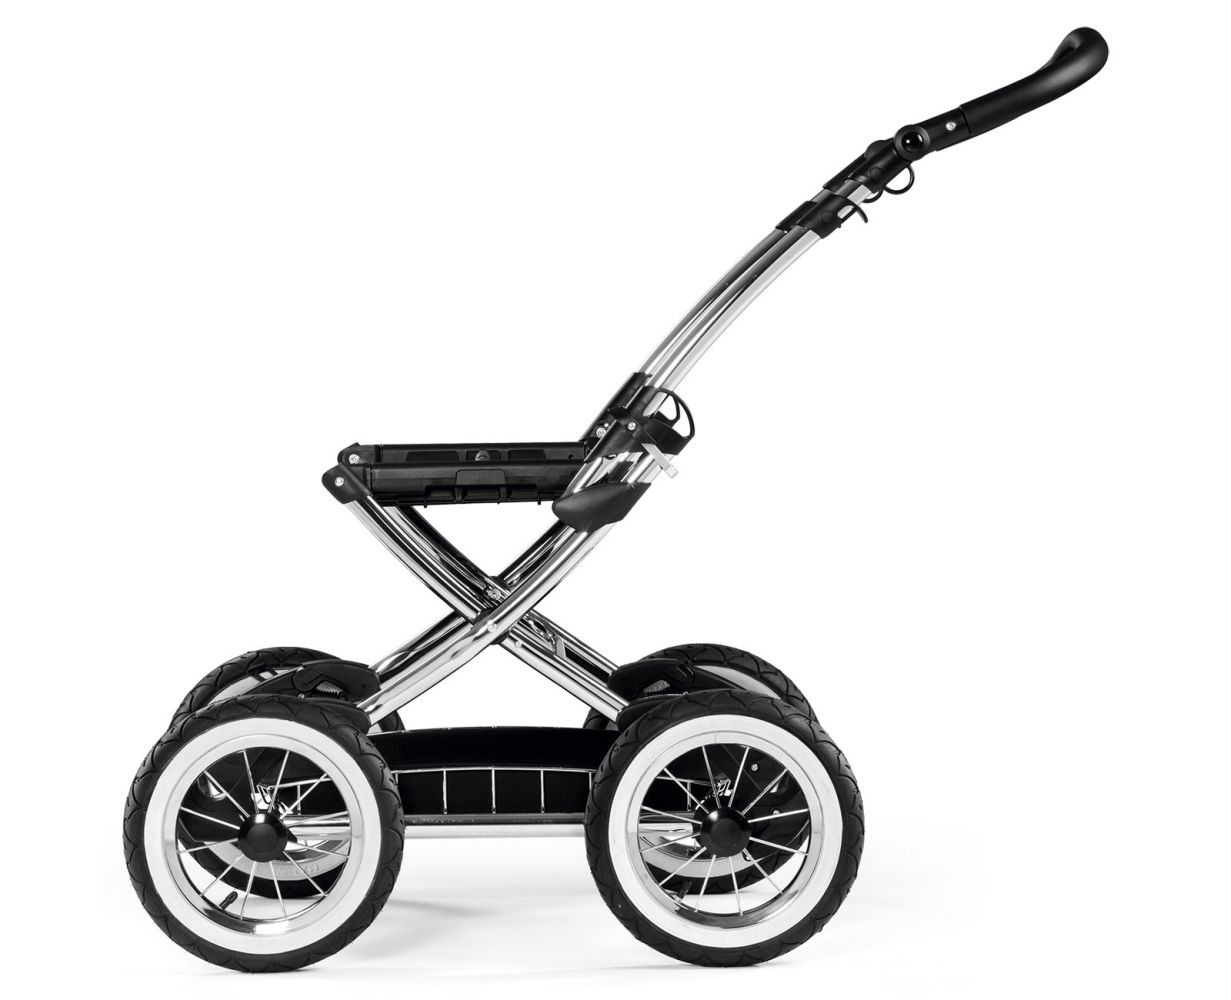 Peg Perego Kinderwagengestell Classico Chrom Bild 1